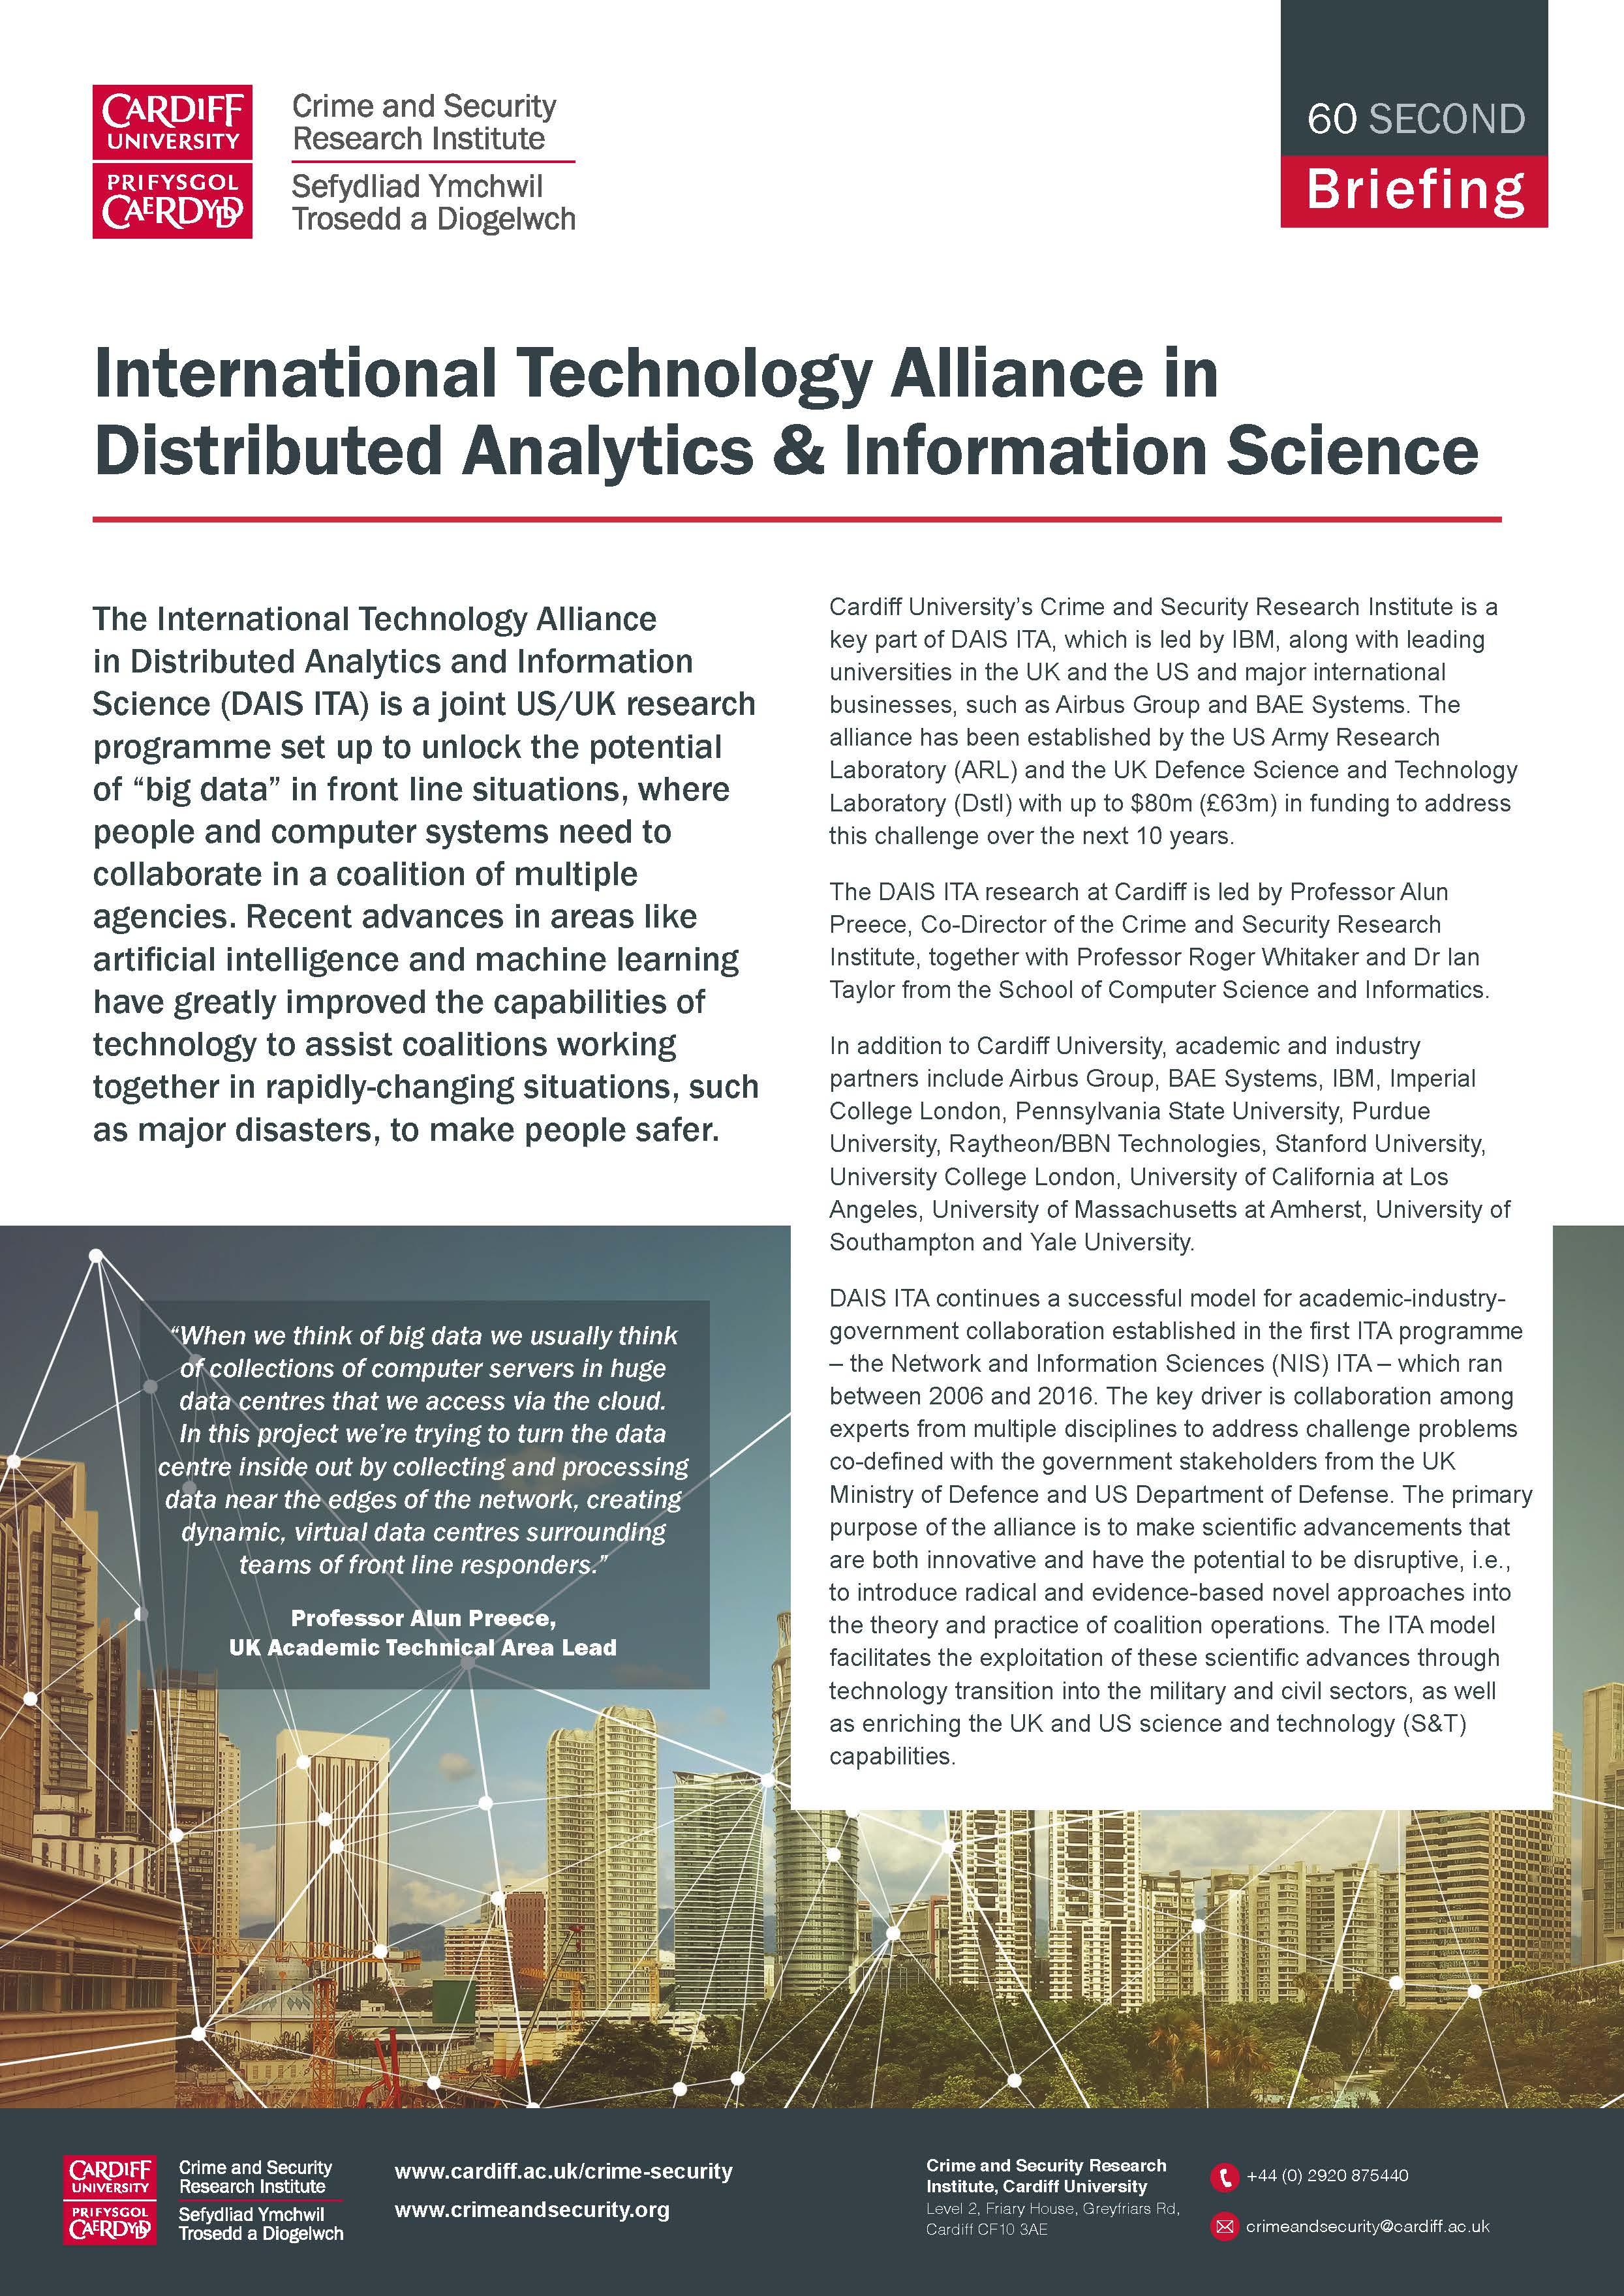 International Technology Alliance in Distributed Analytics & Information Science[ITA DAIS] -